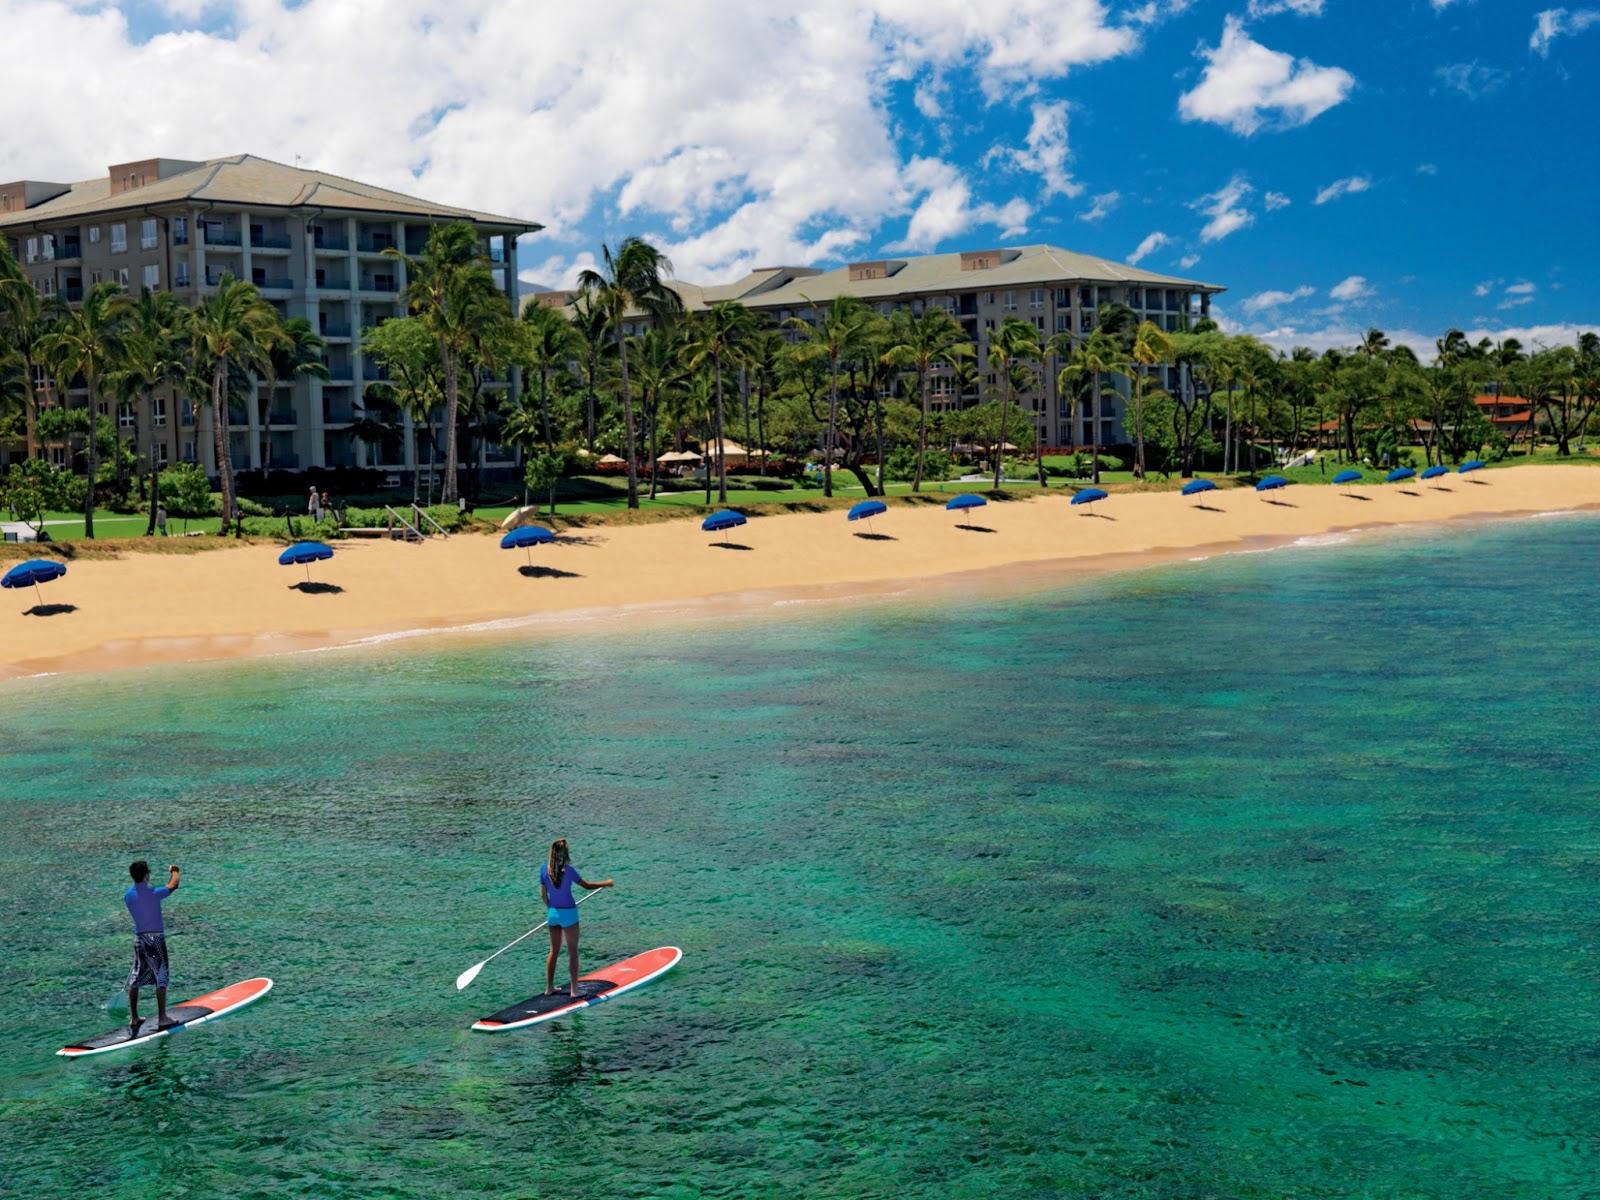 Luxury hotels four seasons maui resort for Best luxury hotels in maui